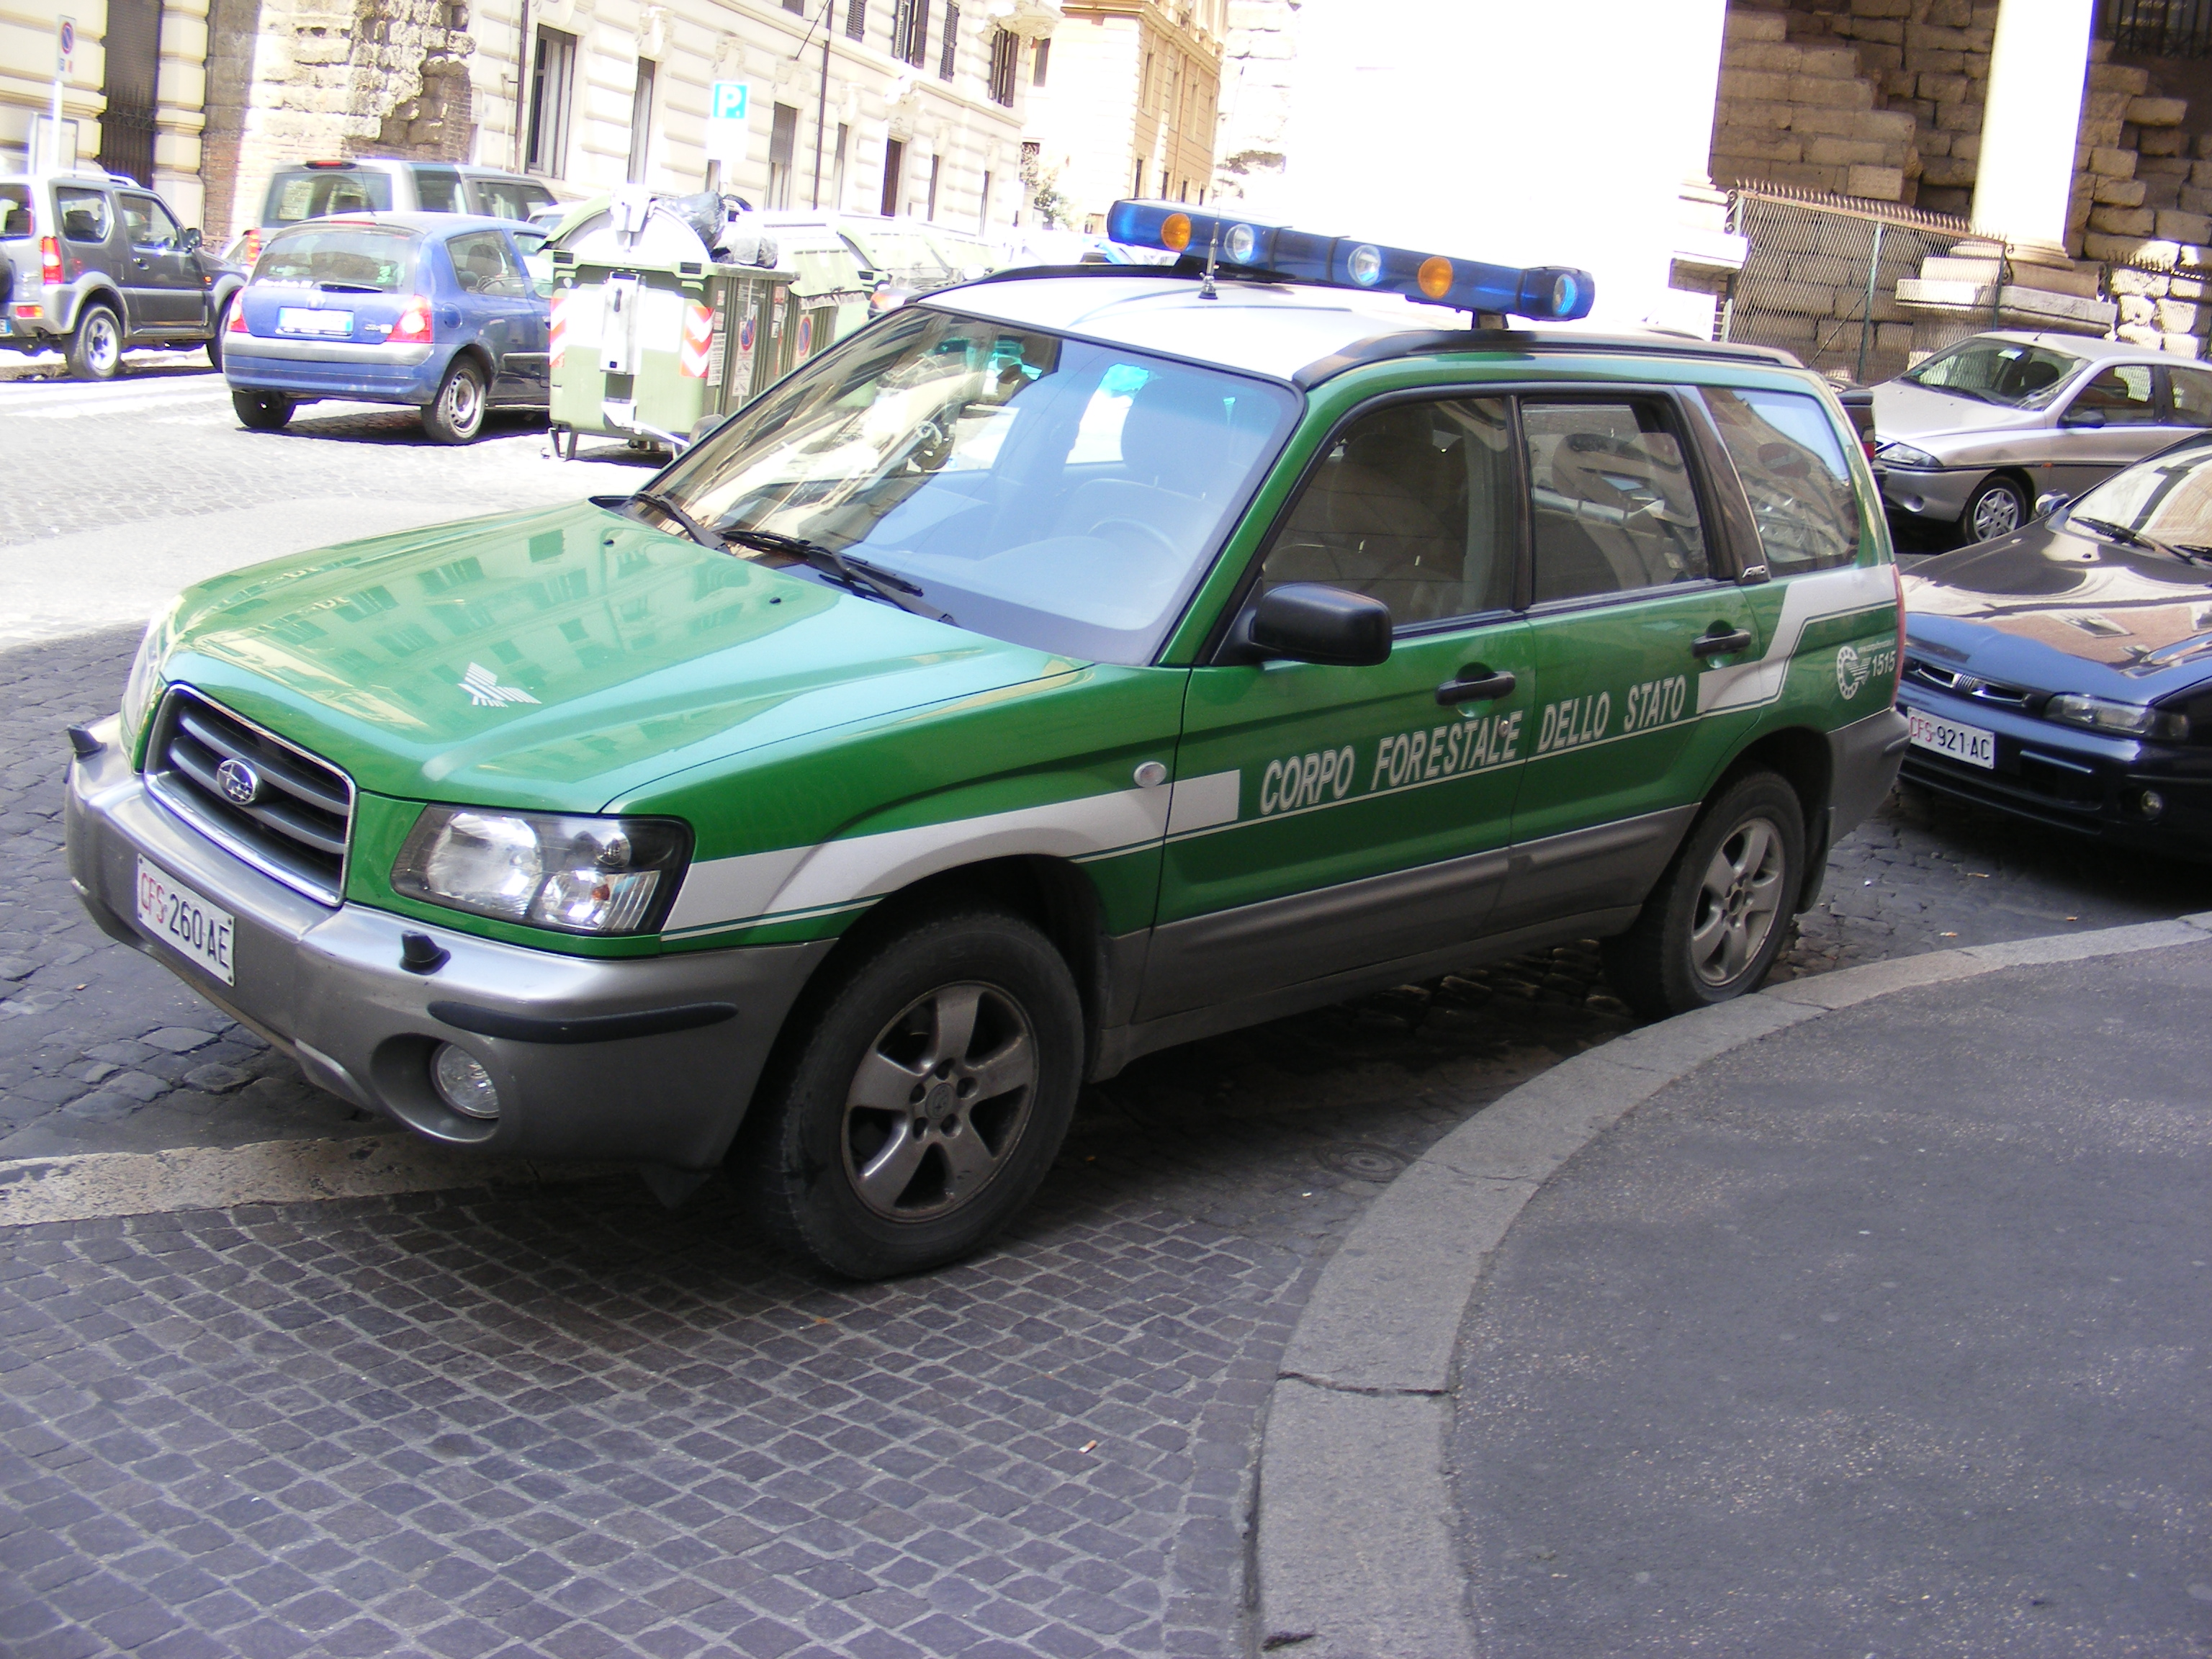 Brindisi, arrestate guardie forestali